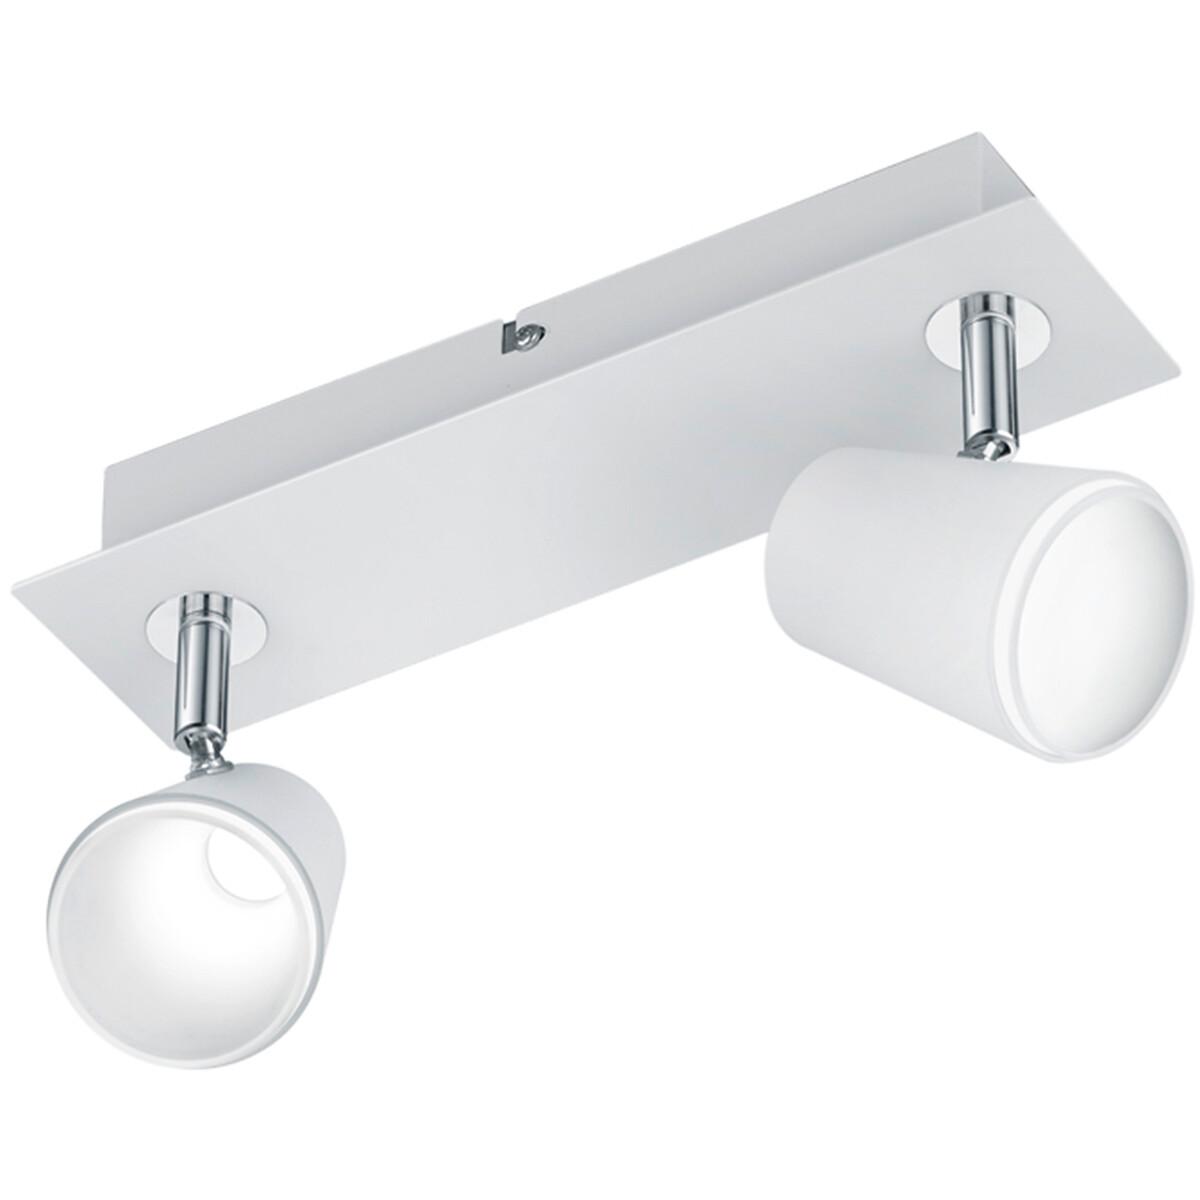 LED Plafondspot - Trion Narca - 12W - Warm Wit 3000K - 2-lichts - Rechthoek - Mat Wit - Aluminium